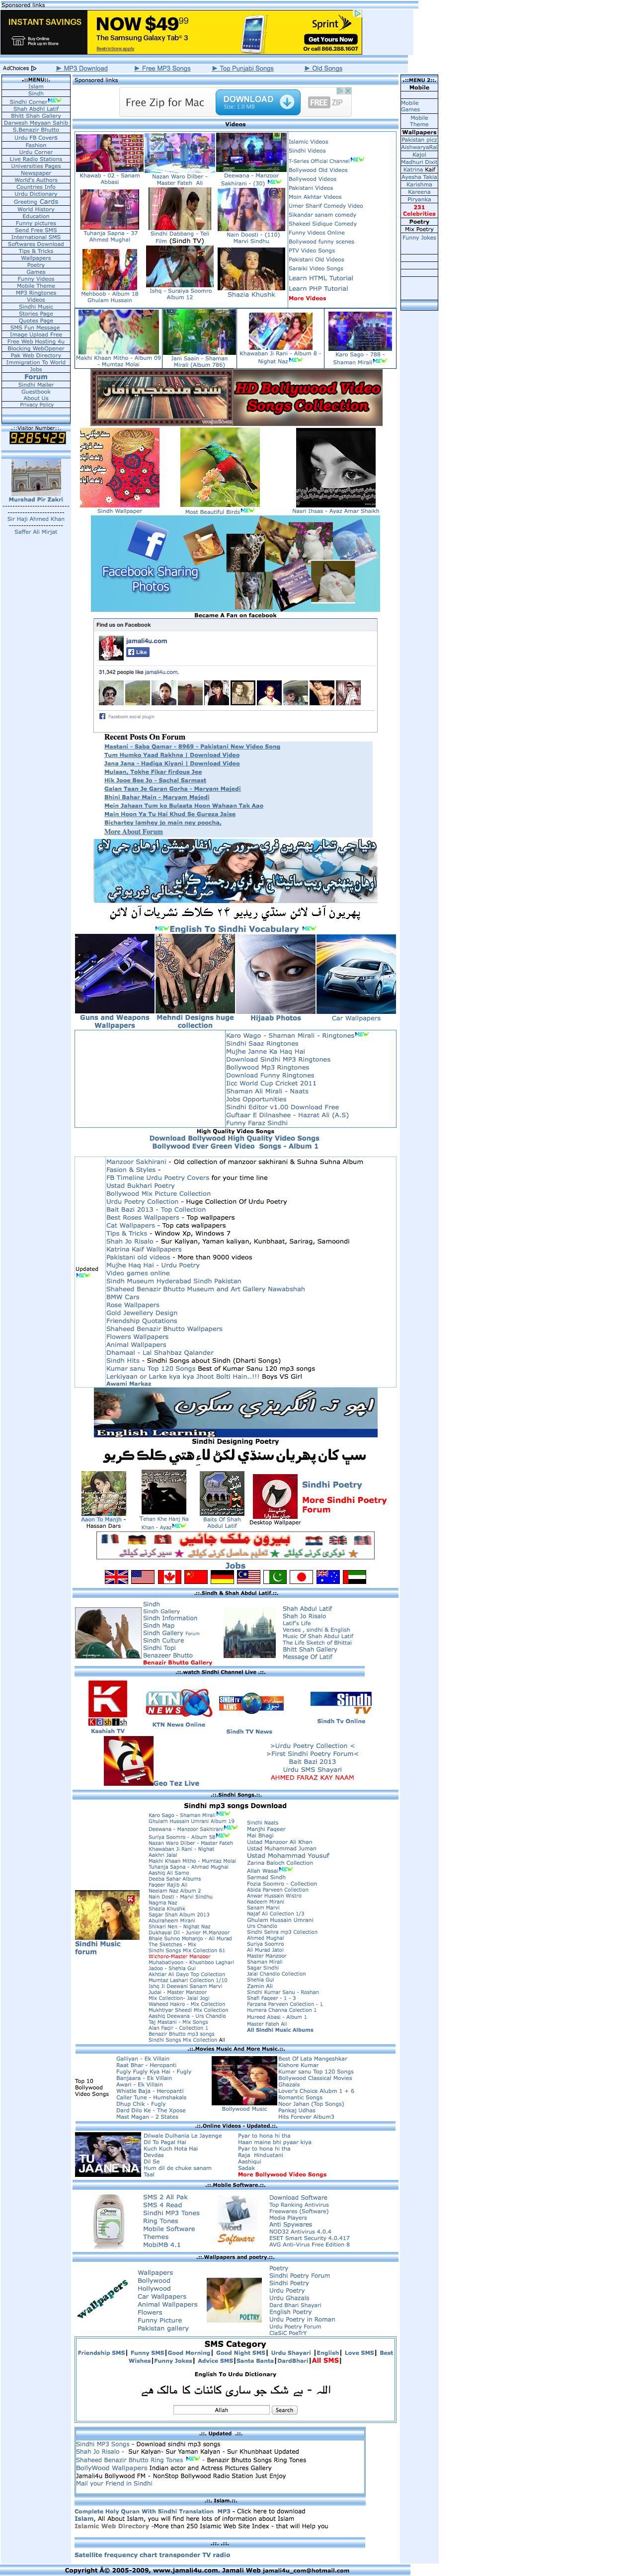 Web Design Example | A page on jamali4u net | Crayon